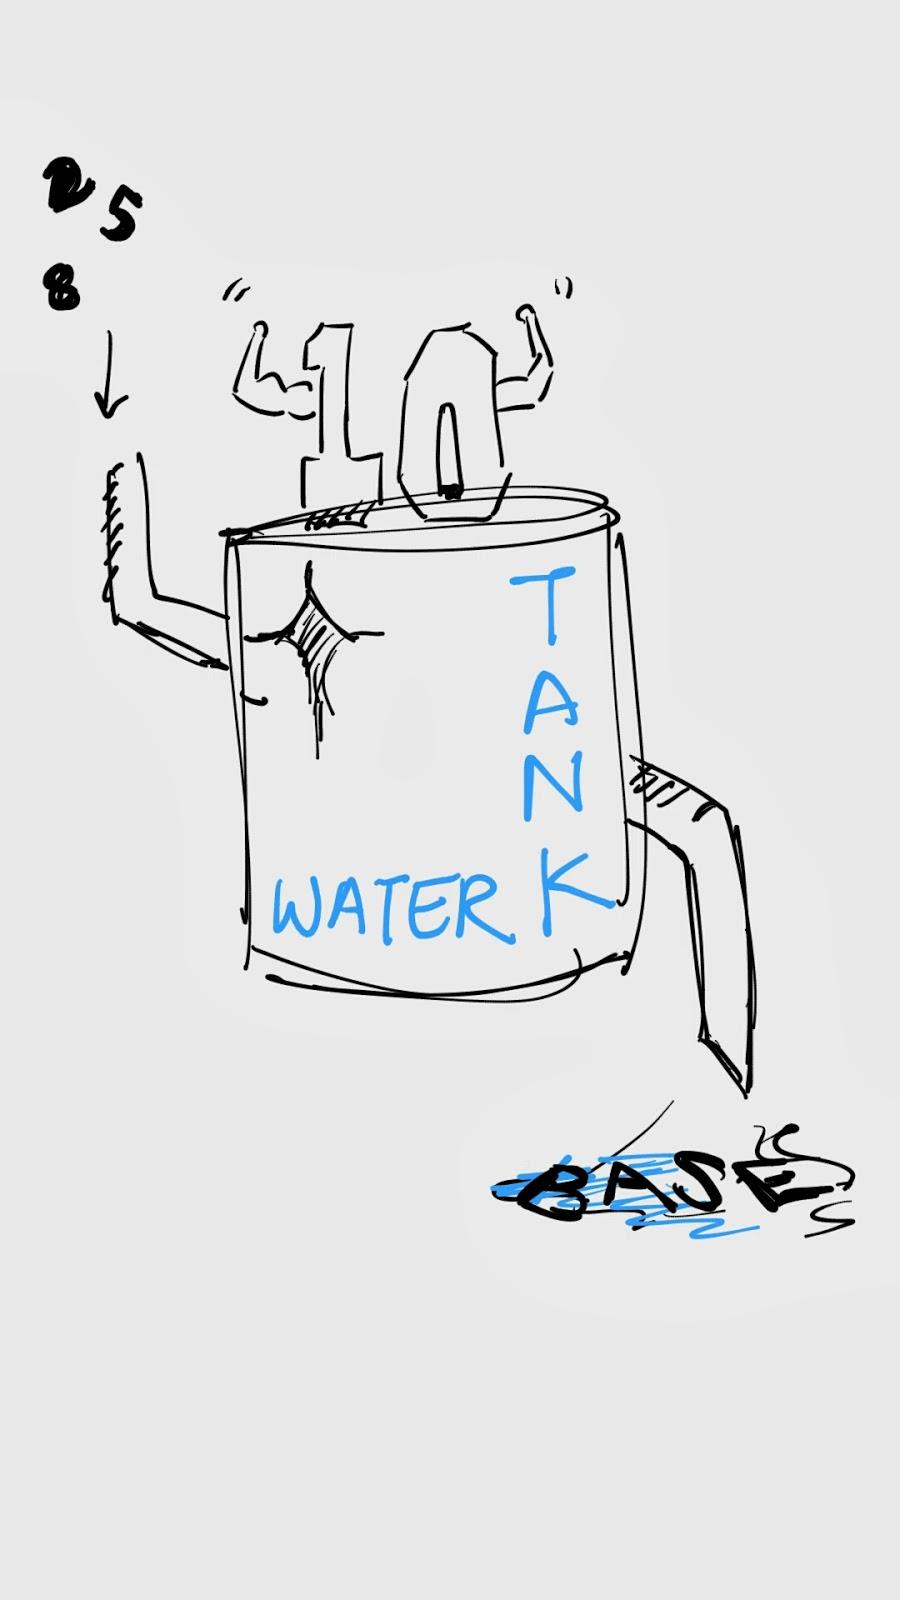 TTC MATHS DEPARTMENT: SOLVE NUMBER BASE USING WATER TANK